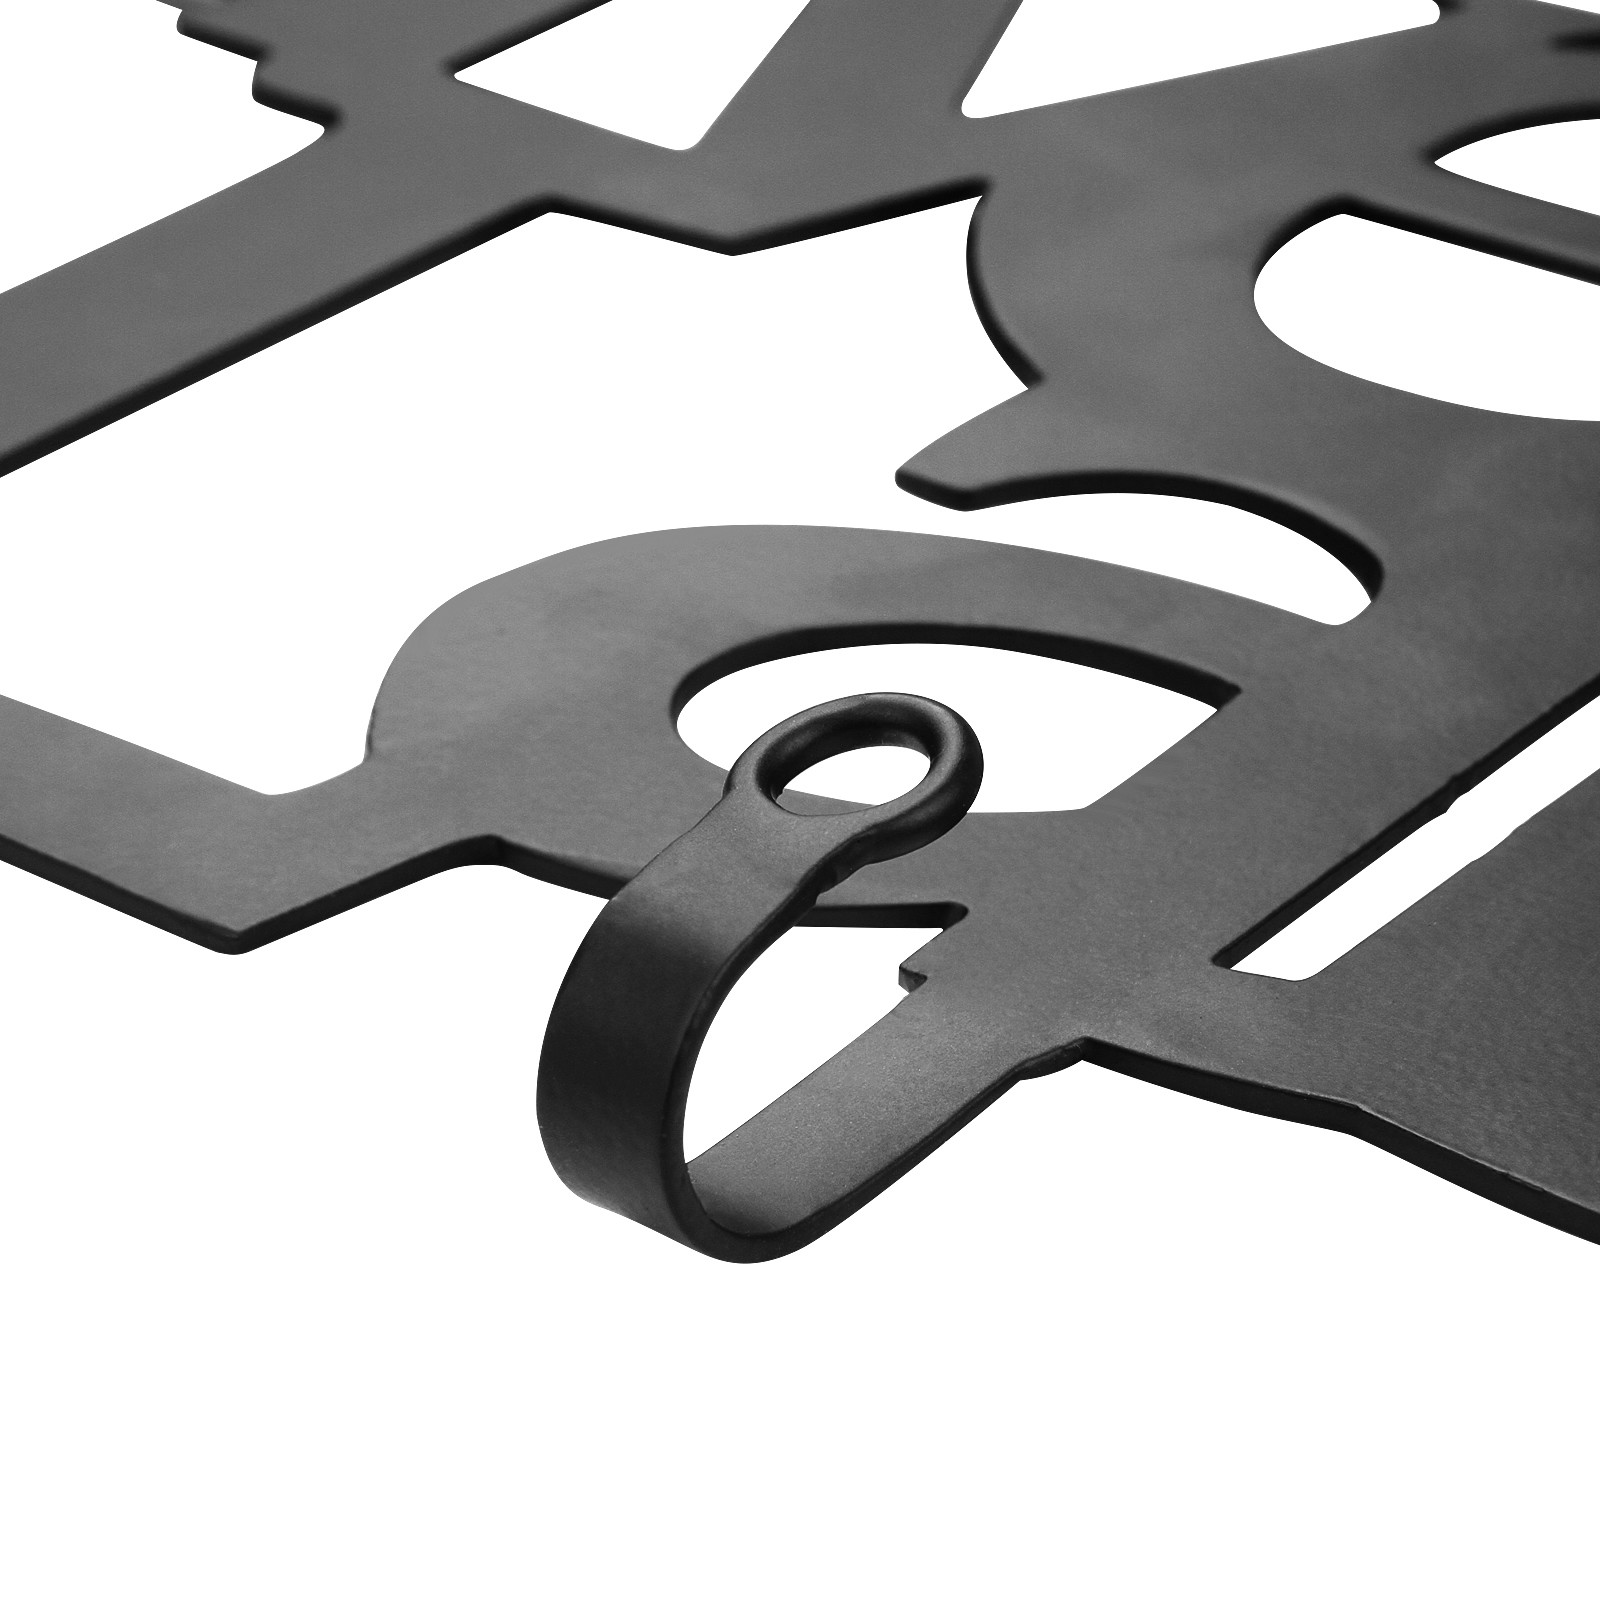 wandgarderobe flurgarderobe metall 6 haken im live love laugh design ebay. Black Bedroom Furniture Sets. Home Design Ideas